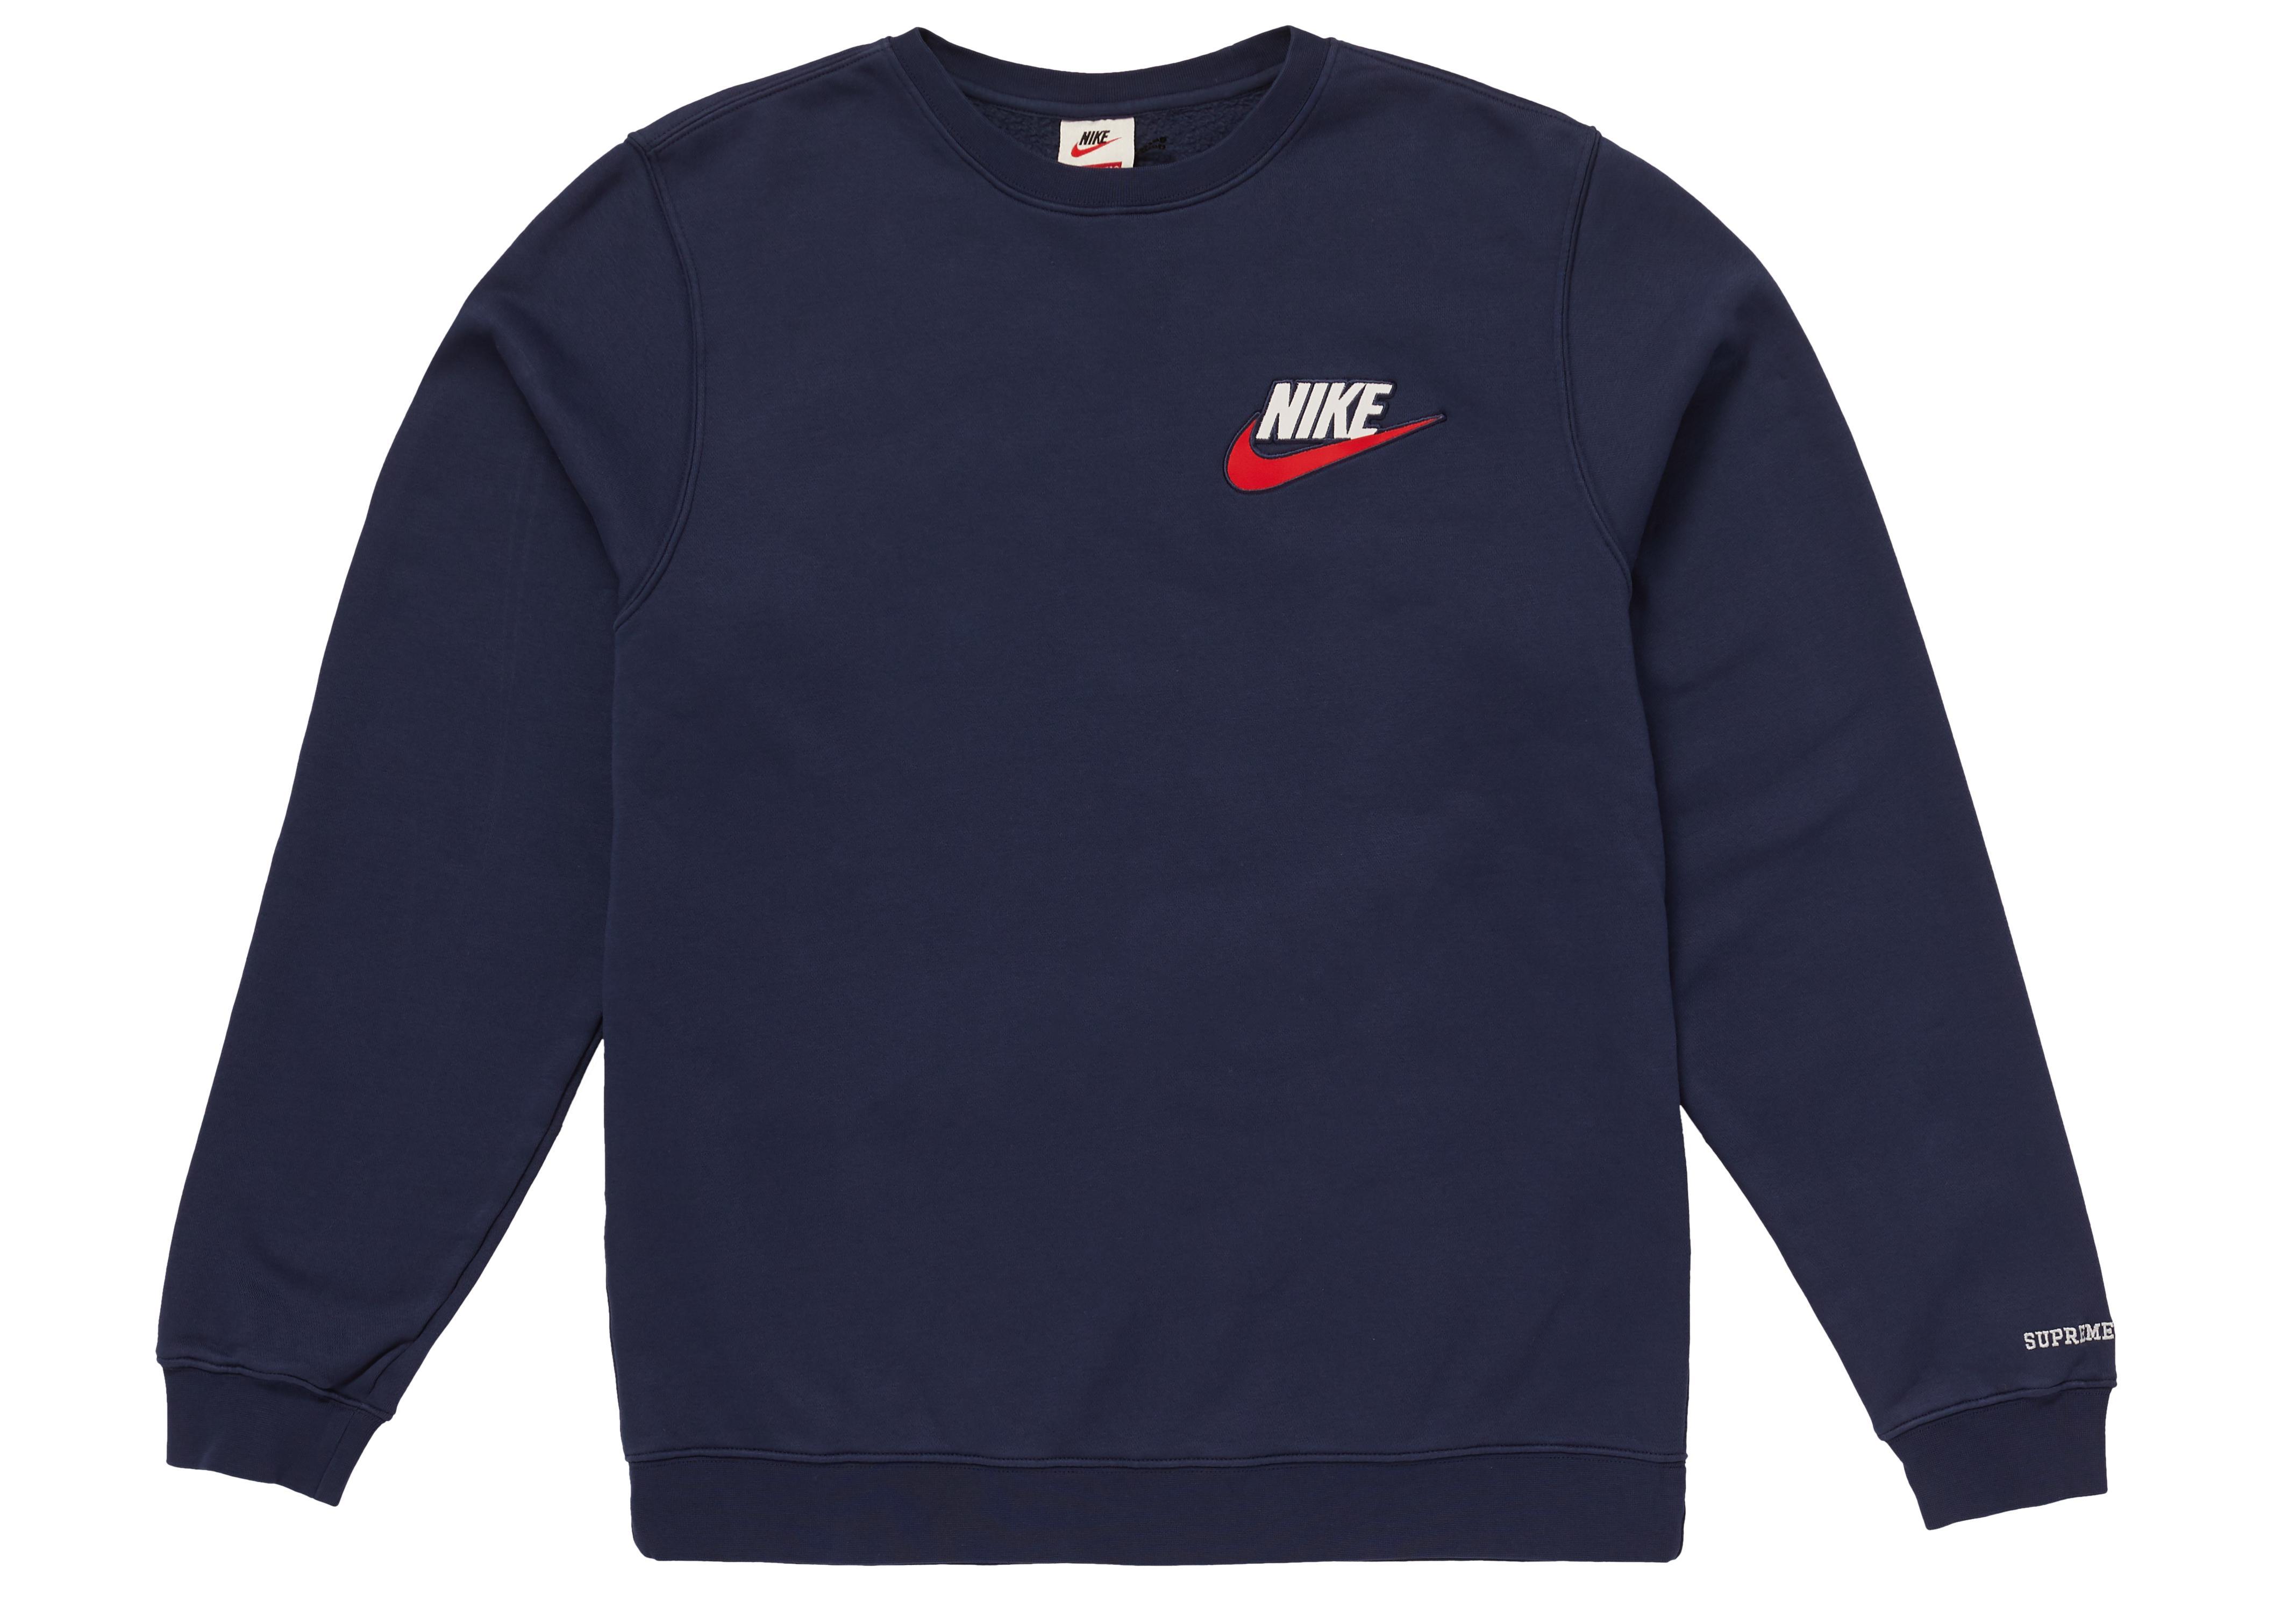 9450ca53 Supreme Blue Nike Crewneck Navy for men. View fullscreen